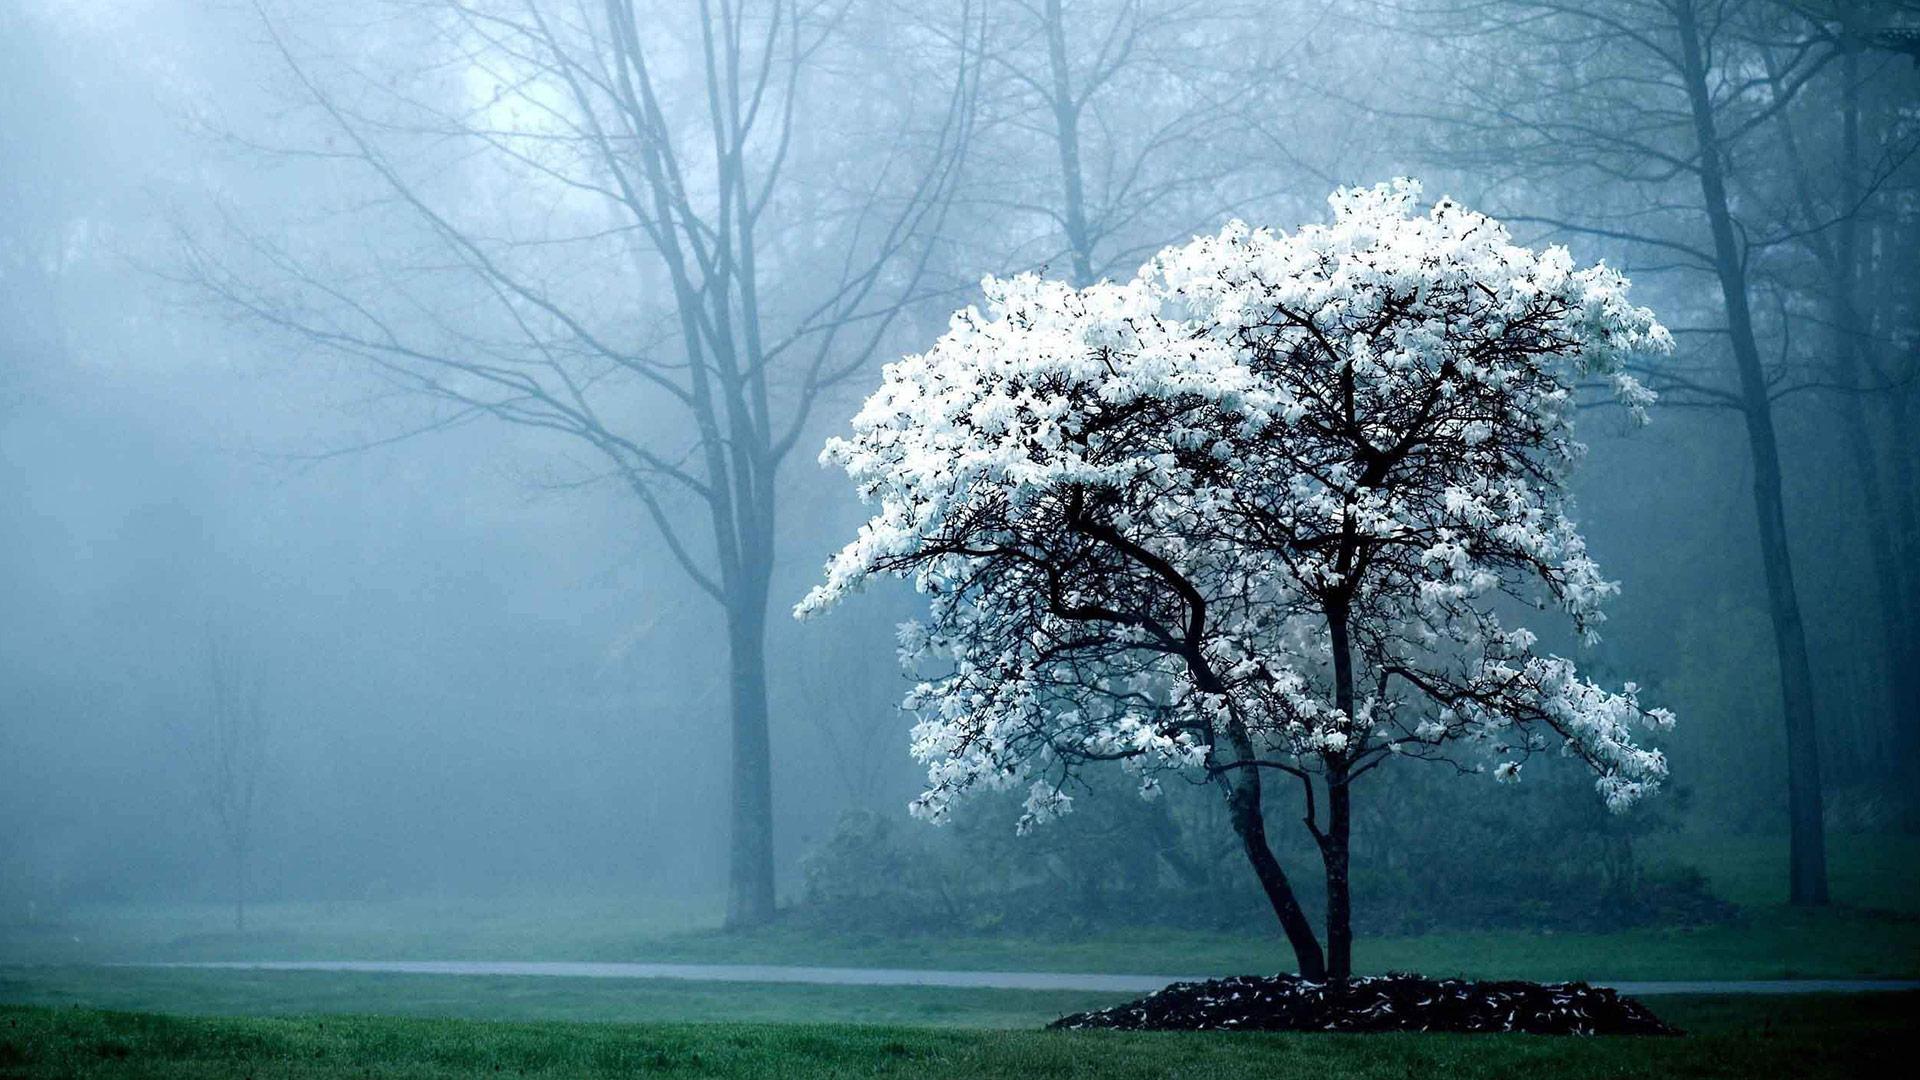 Karma Tree On Foggy Day